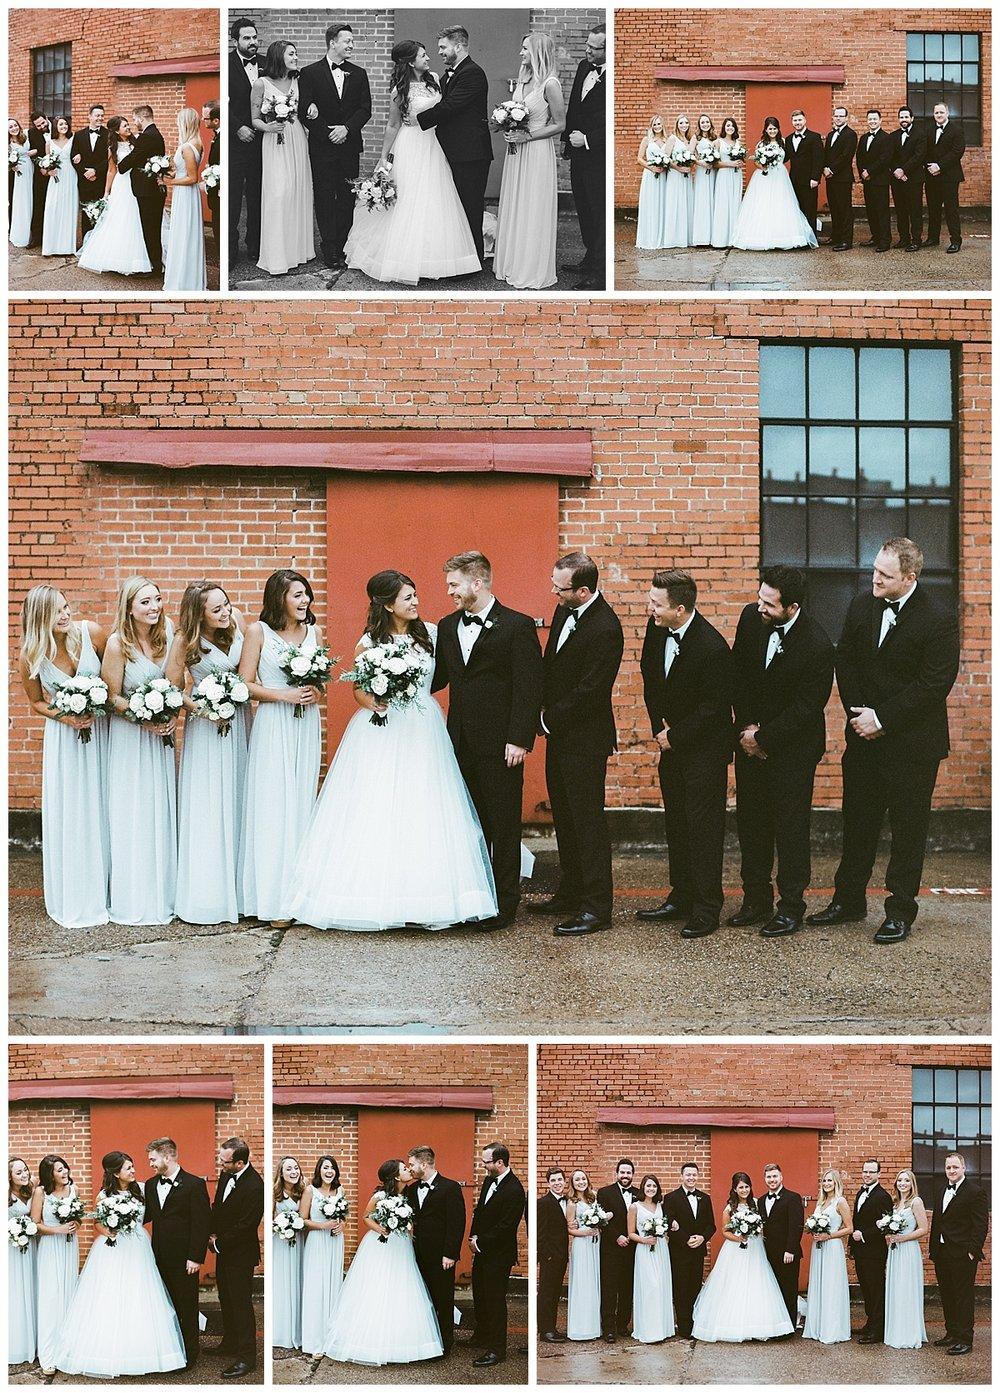 hickory-street-annex-wedding-ar-photography-3.jpg